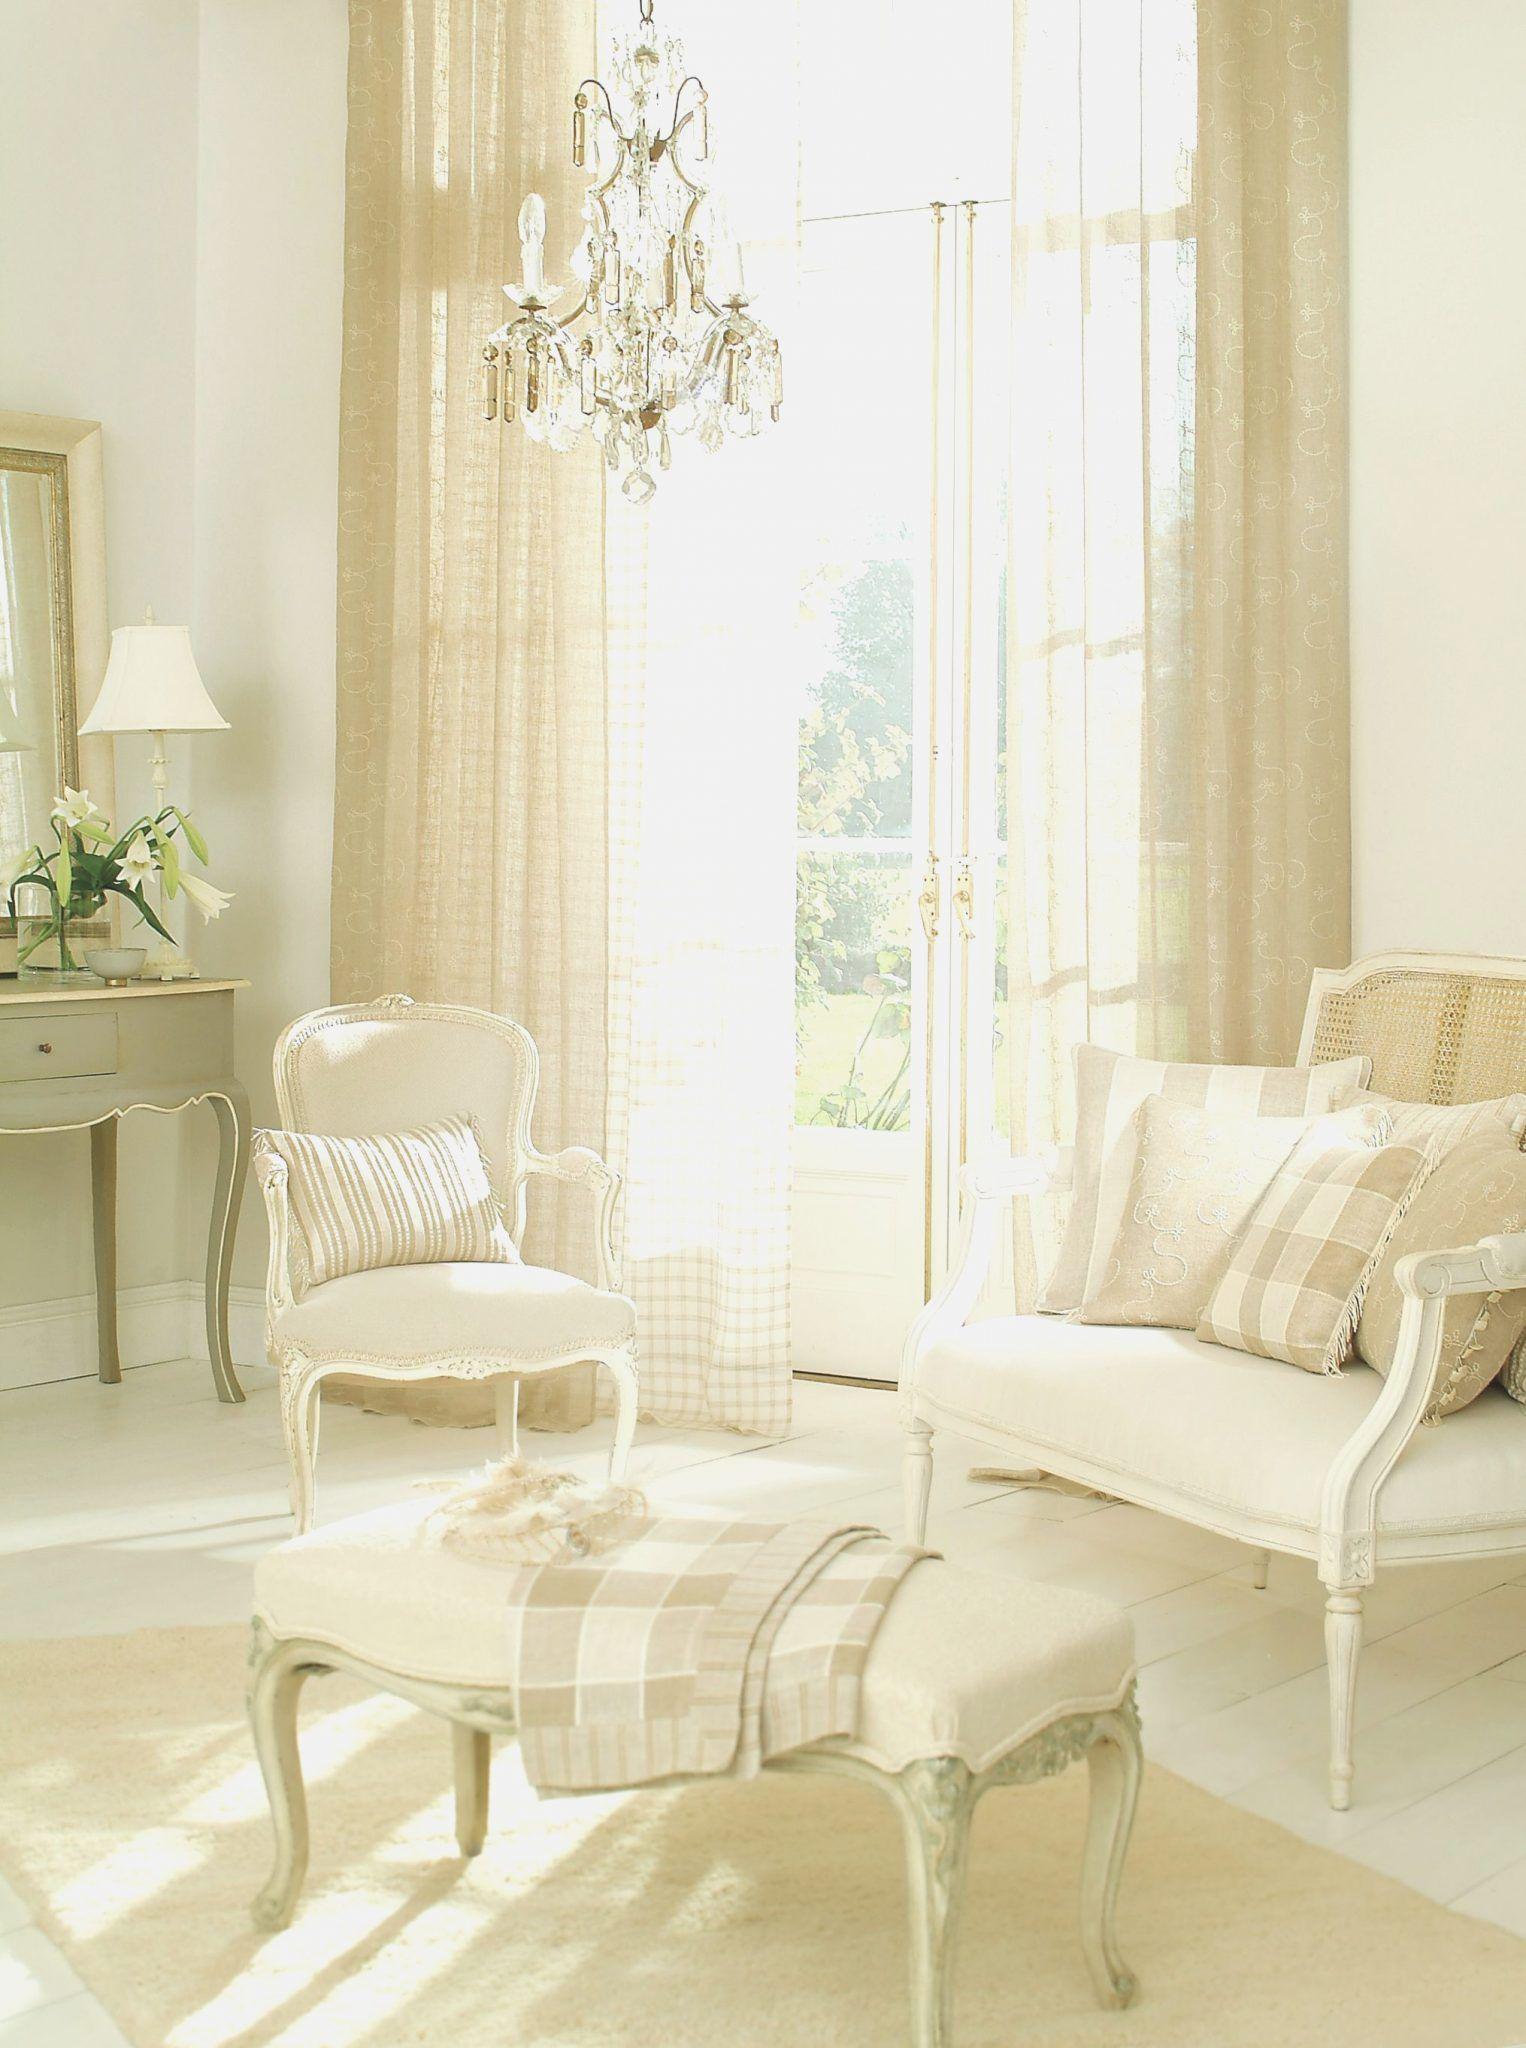 Windows Treatment Ideas for Living Room - bow window treatment ideas ...